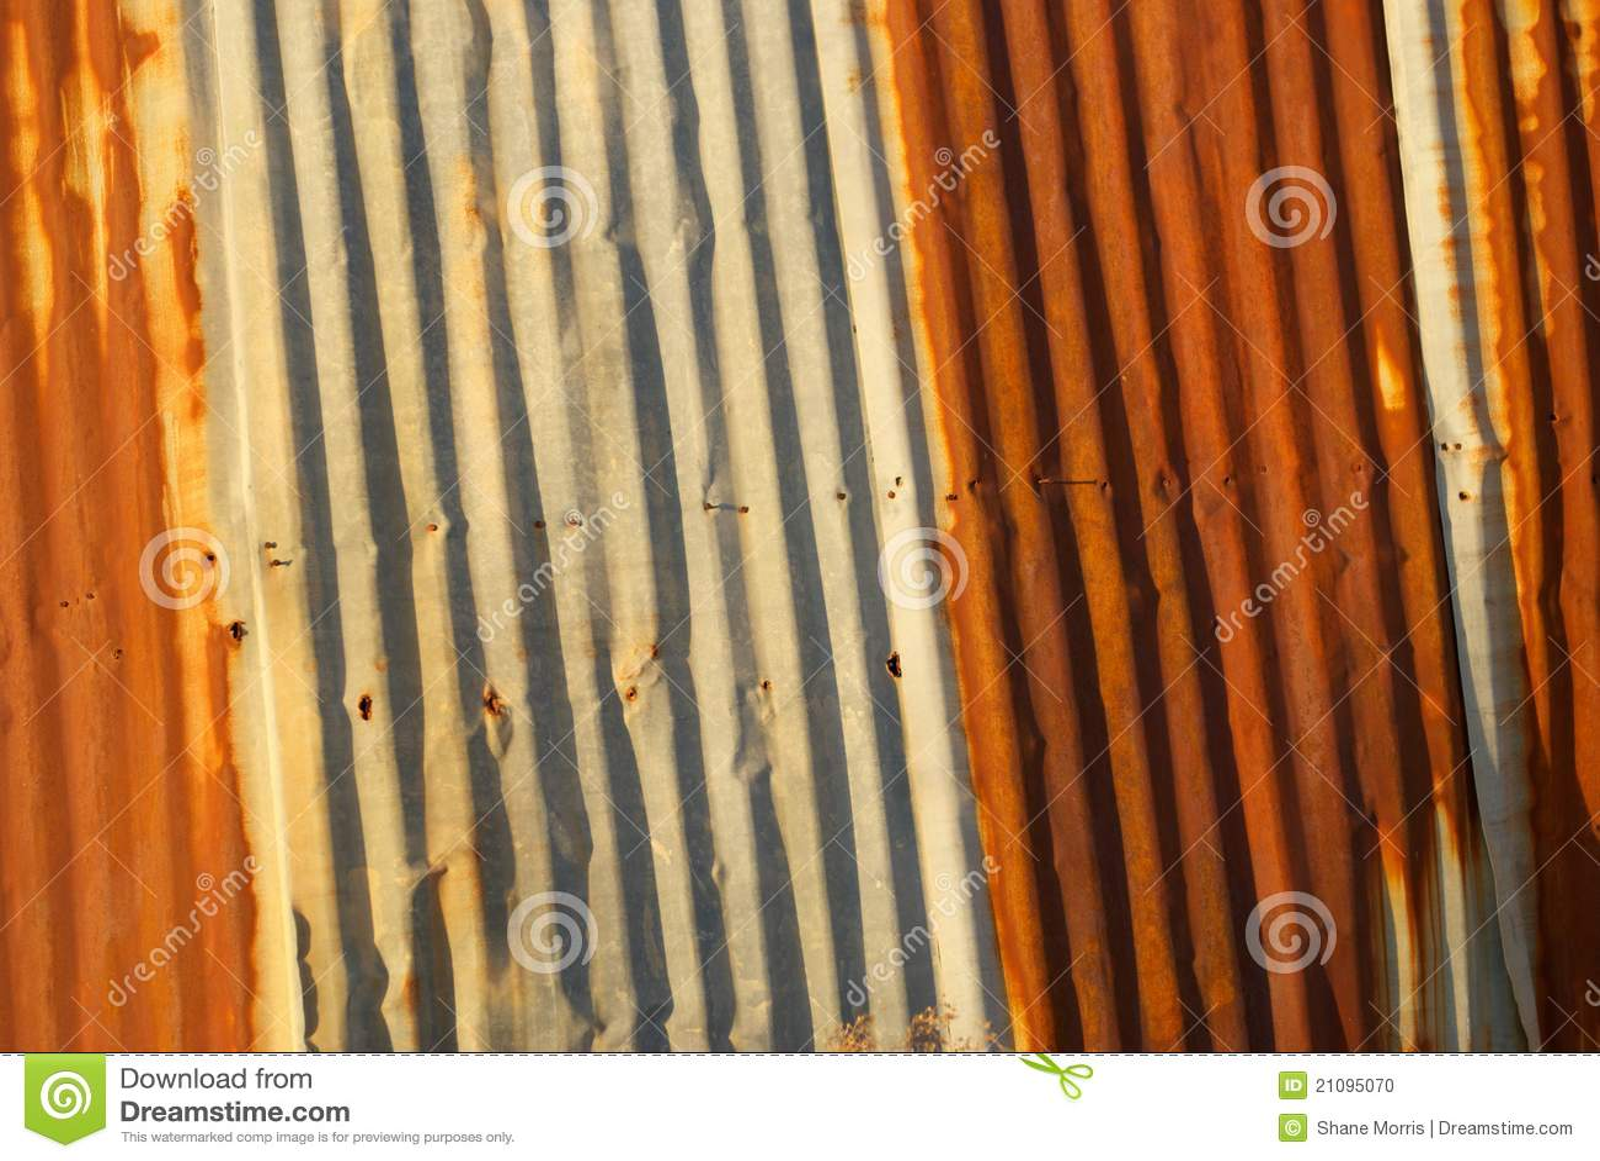 Rusted Corrugated Metal Siding Stock Photo Image 21095070